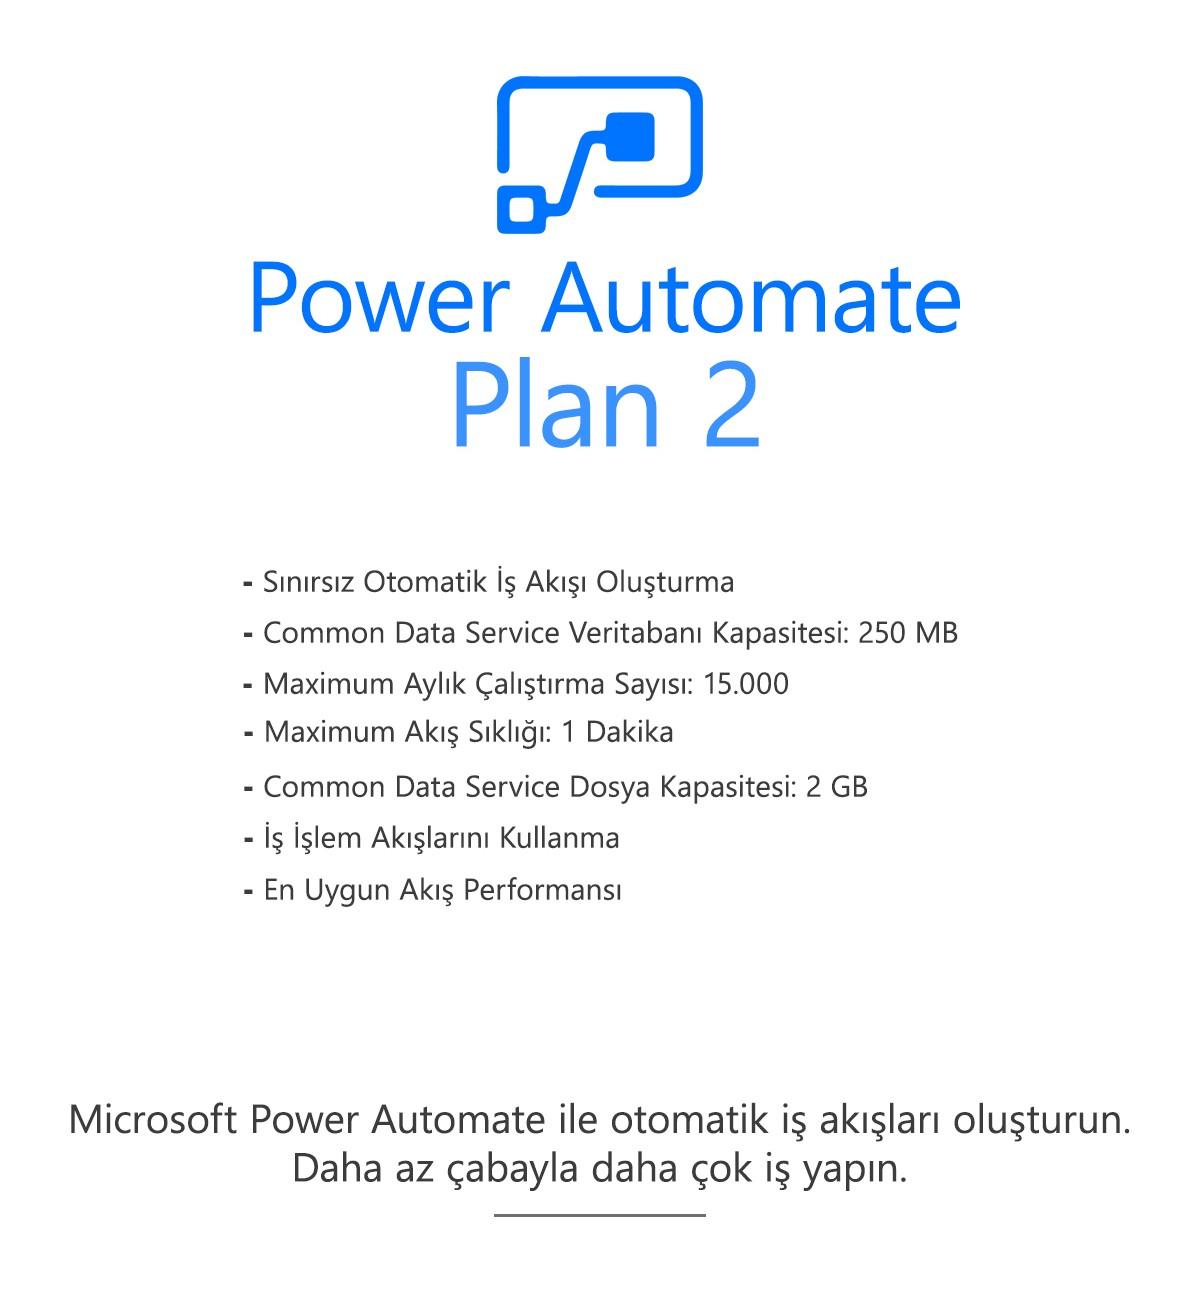 Power Automate Plan 2